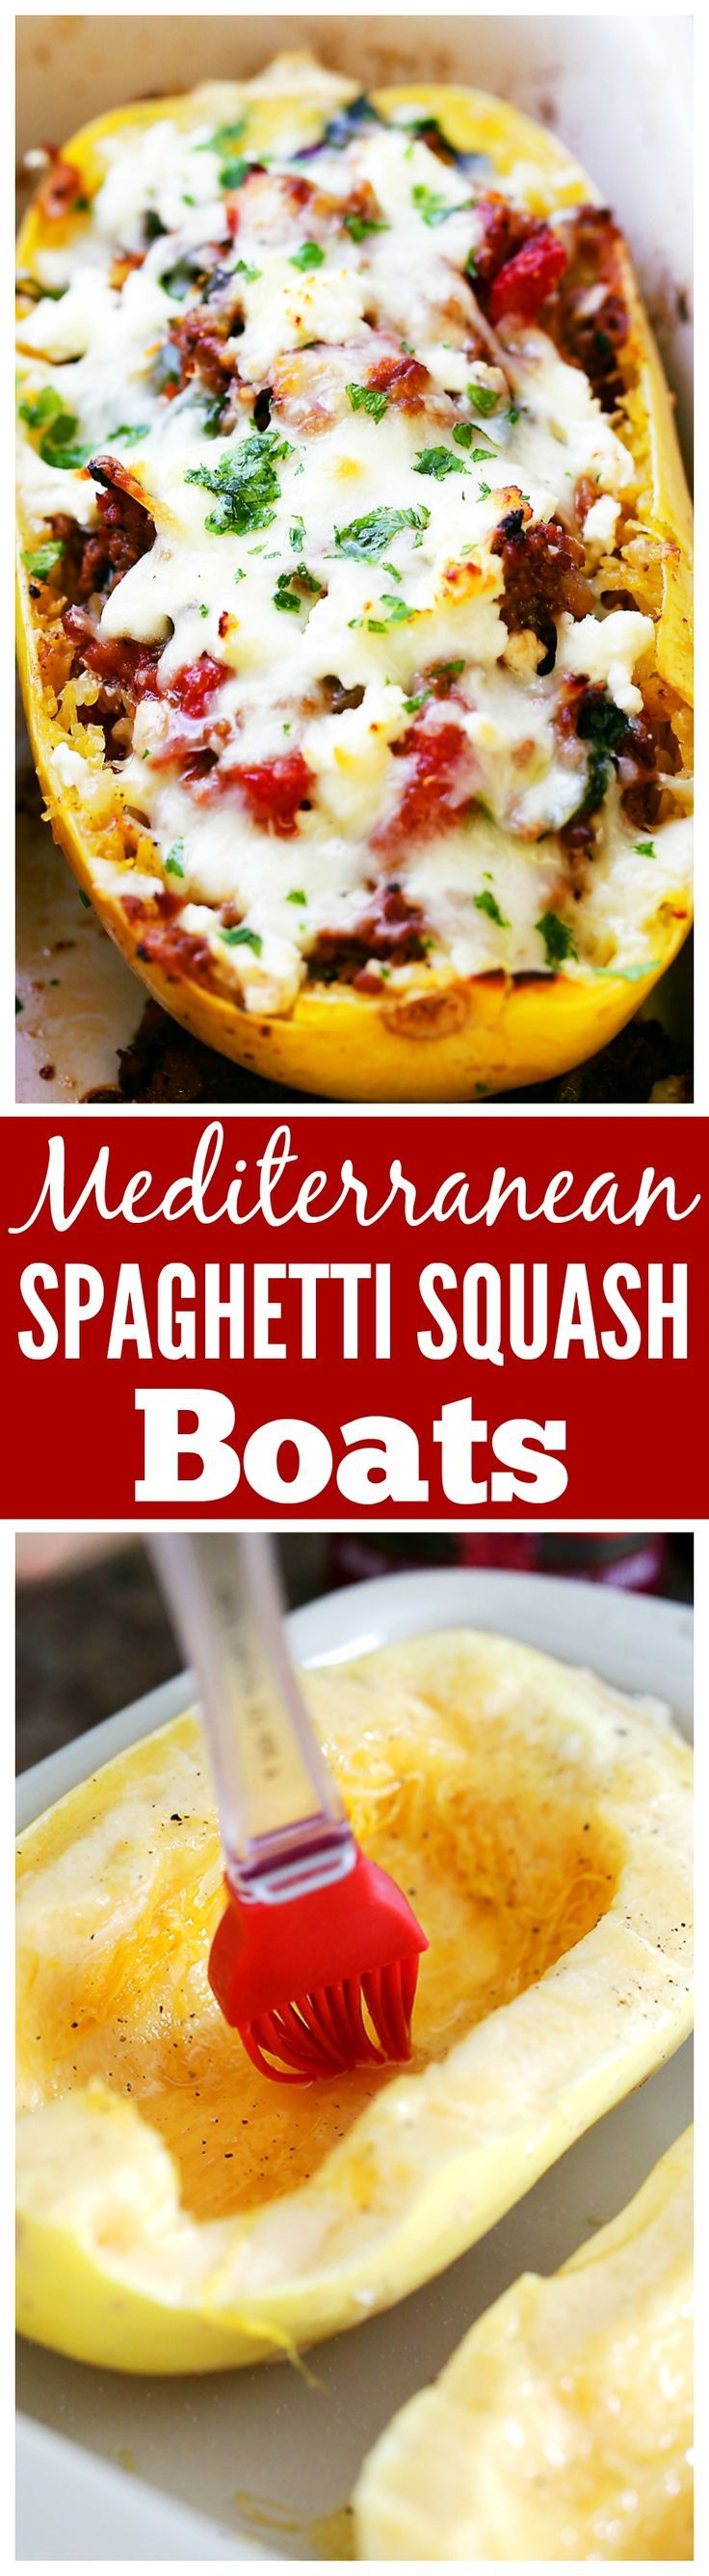 how to make vegetable spaghetti squash